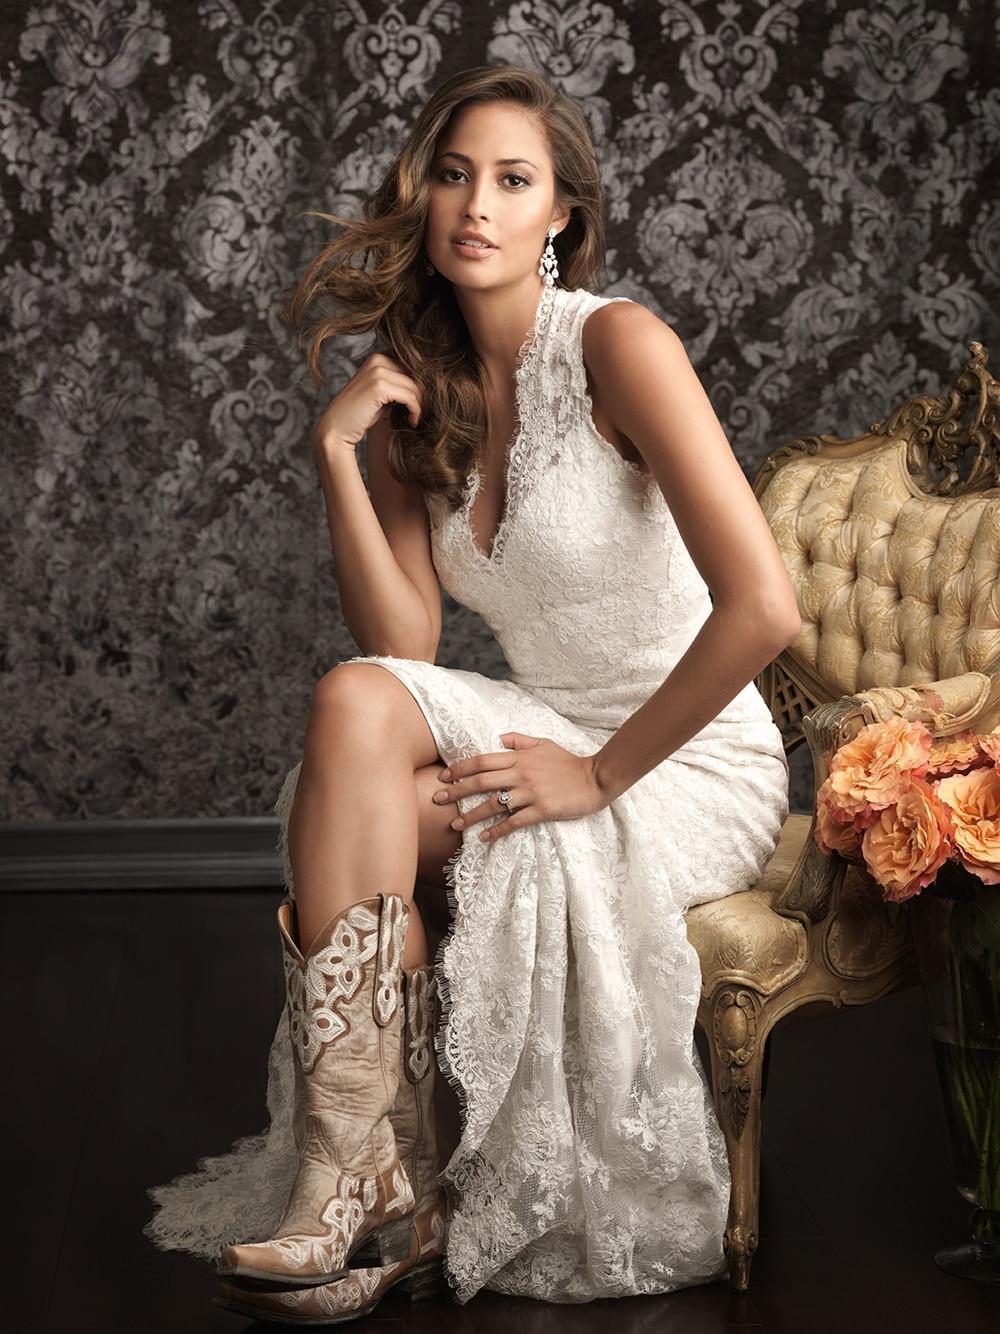 Lace Wedding Dresses with Cowboy Boots 1d53e8f8a71a